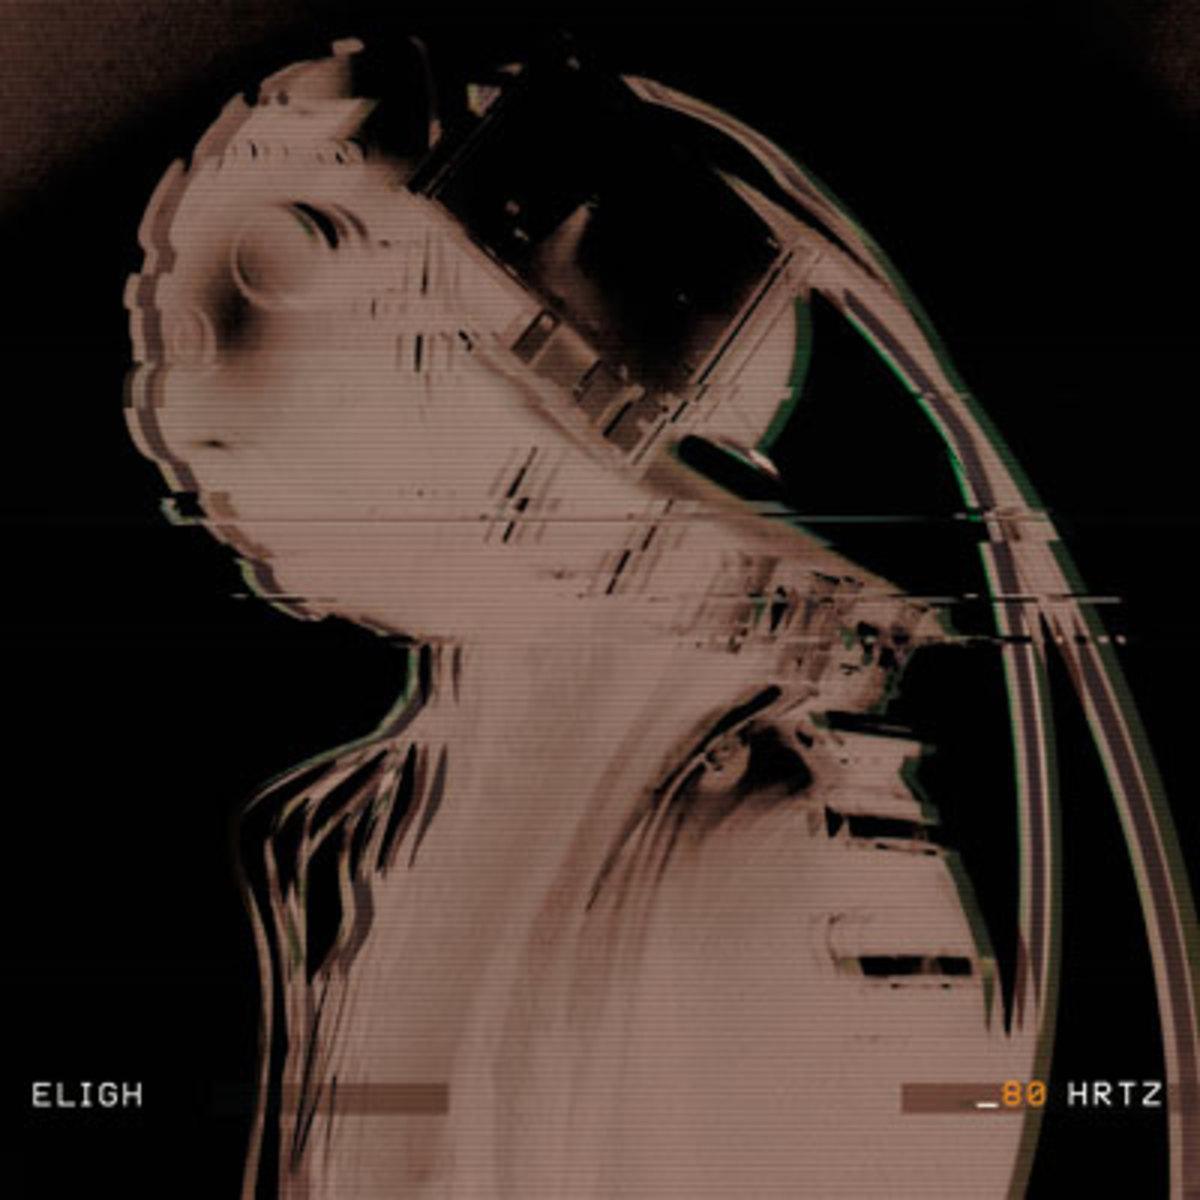 eligh-80-hrtz.jpg